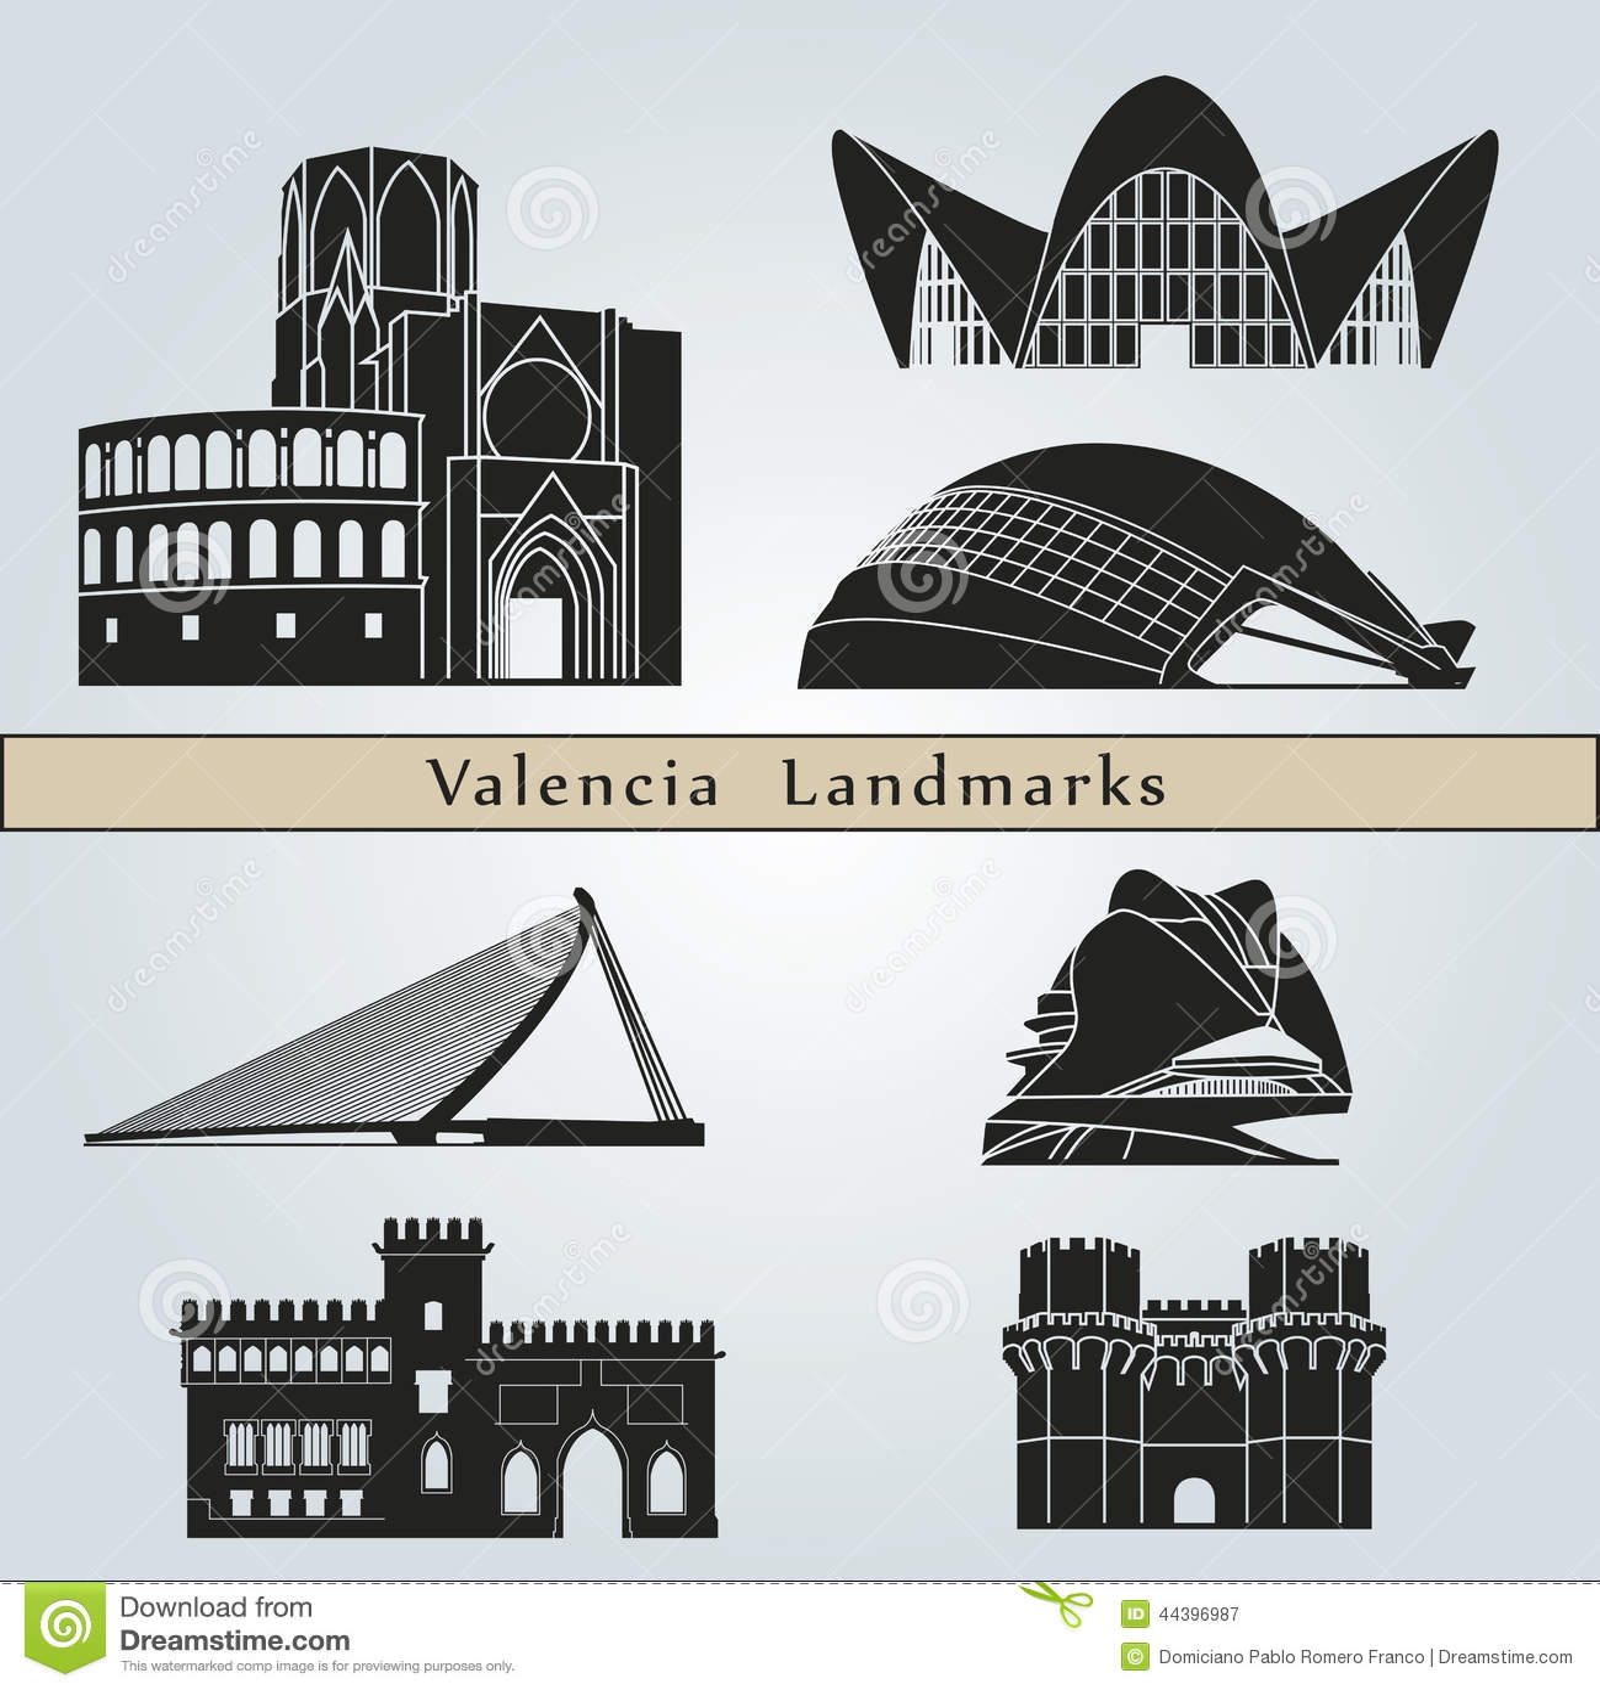 Valencia Landmarks